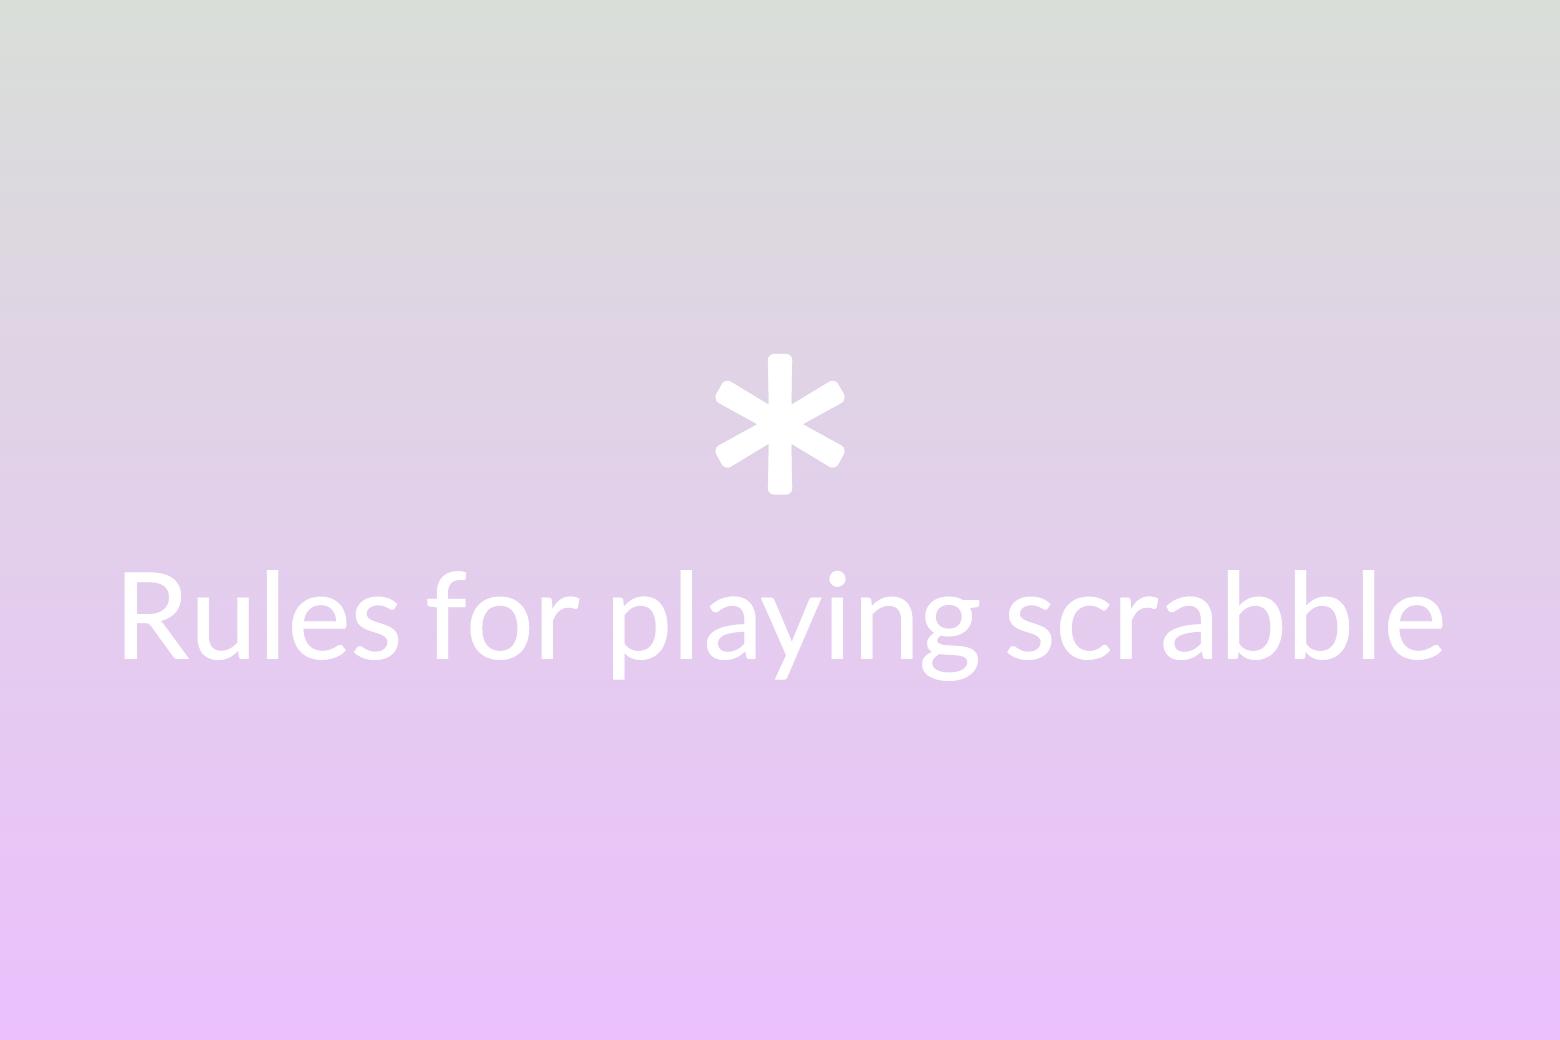 https://d33wubrfki0l68.cloudfront.net/de84f359b79d9d63655d2b56f8c3c8c48d0ee1dc/03391/uploads/rules_for_scrabble.png